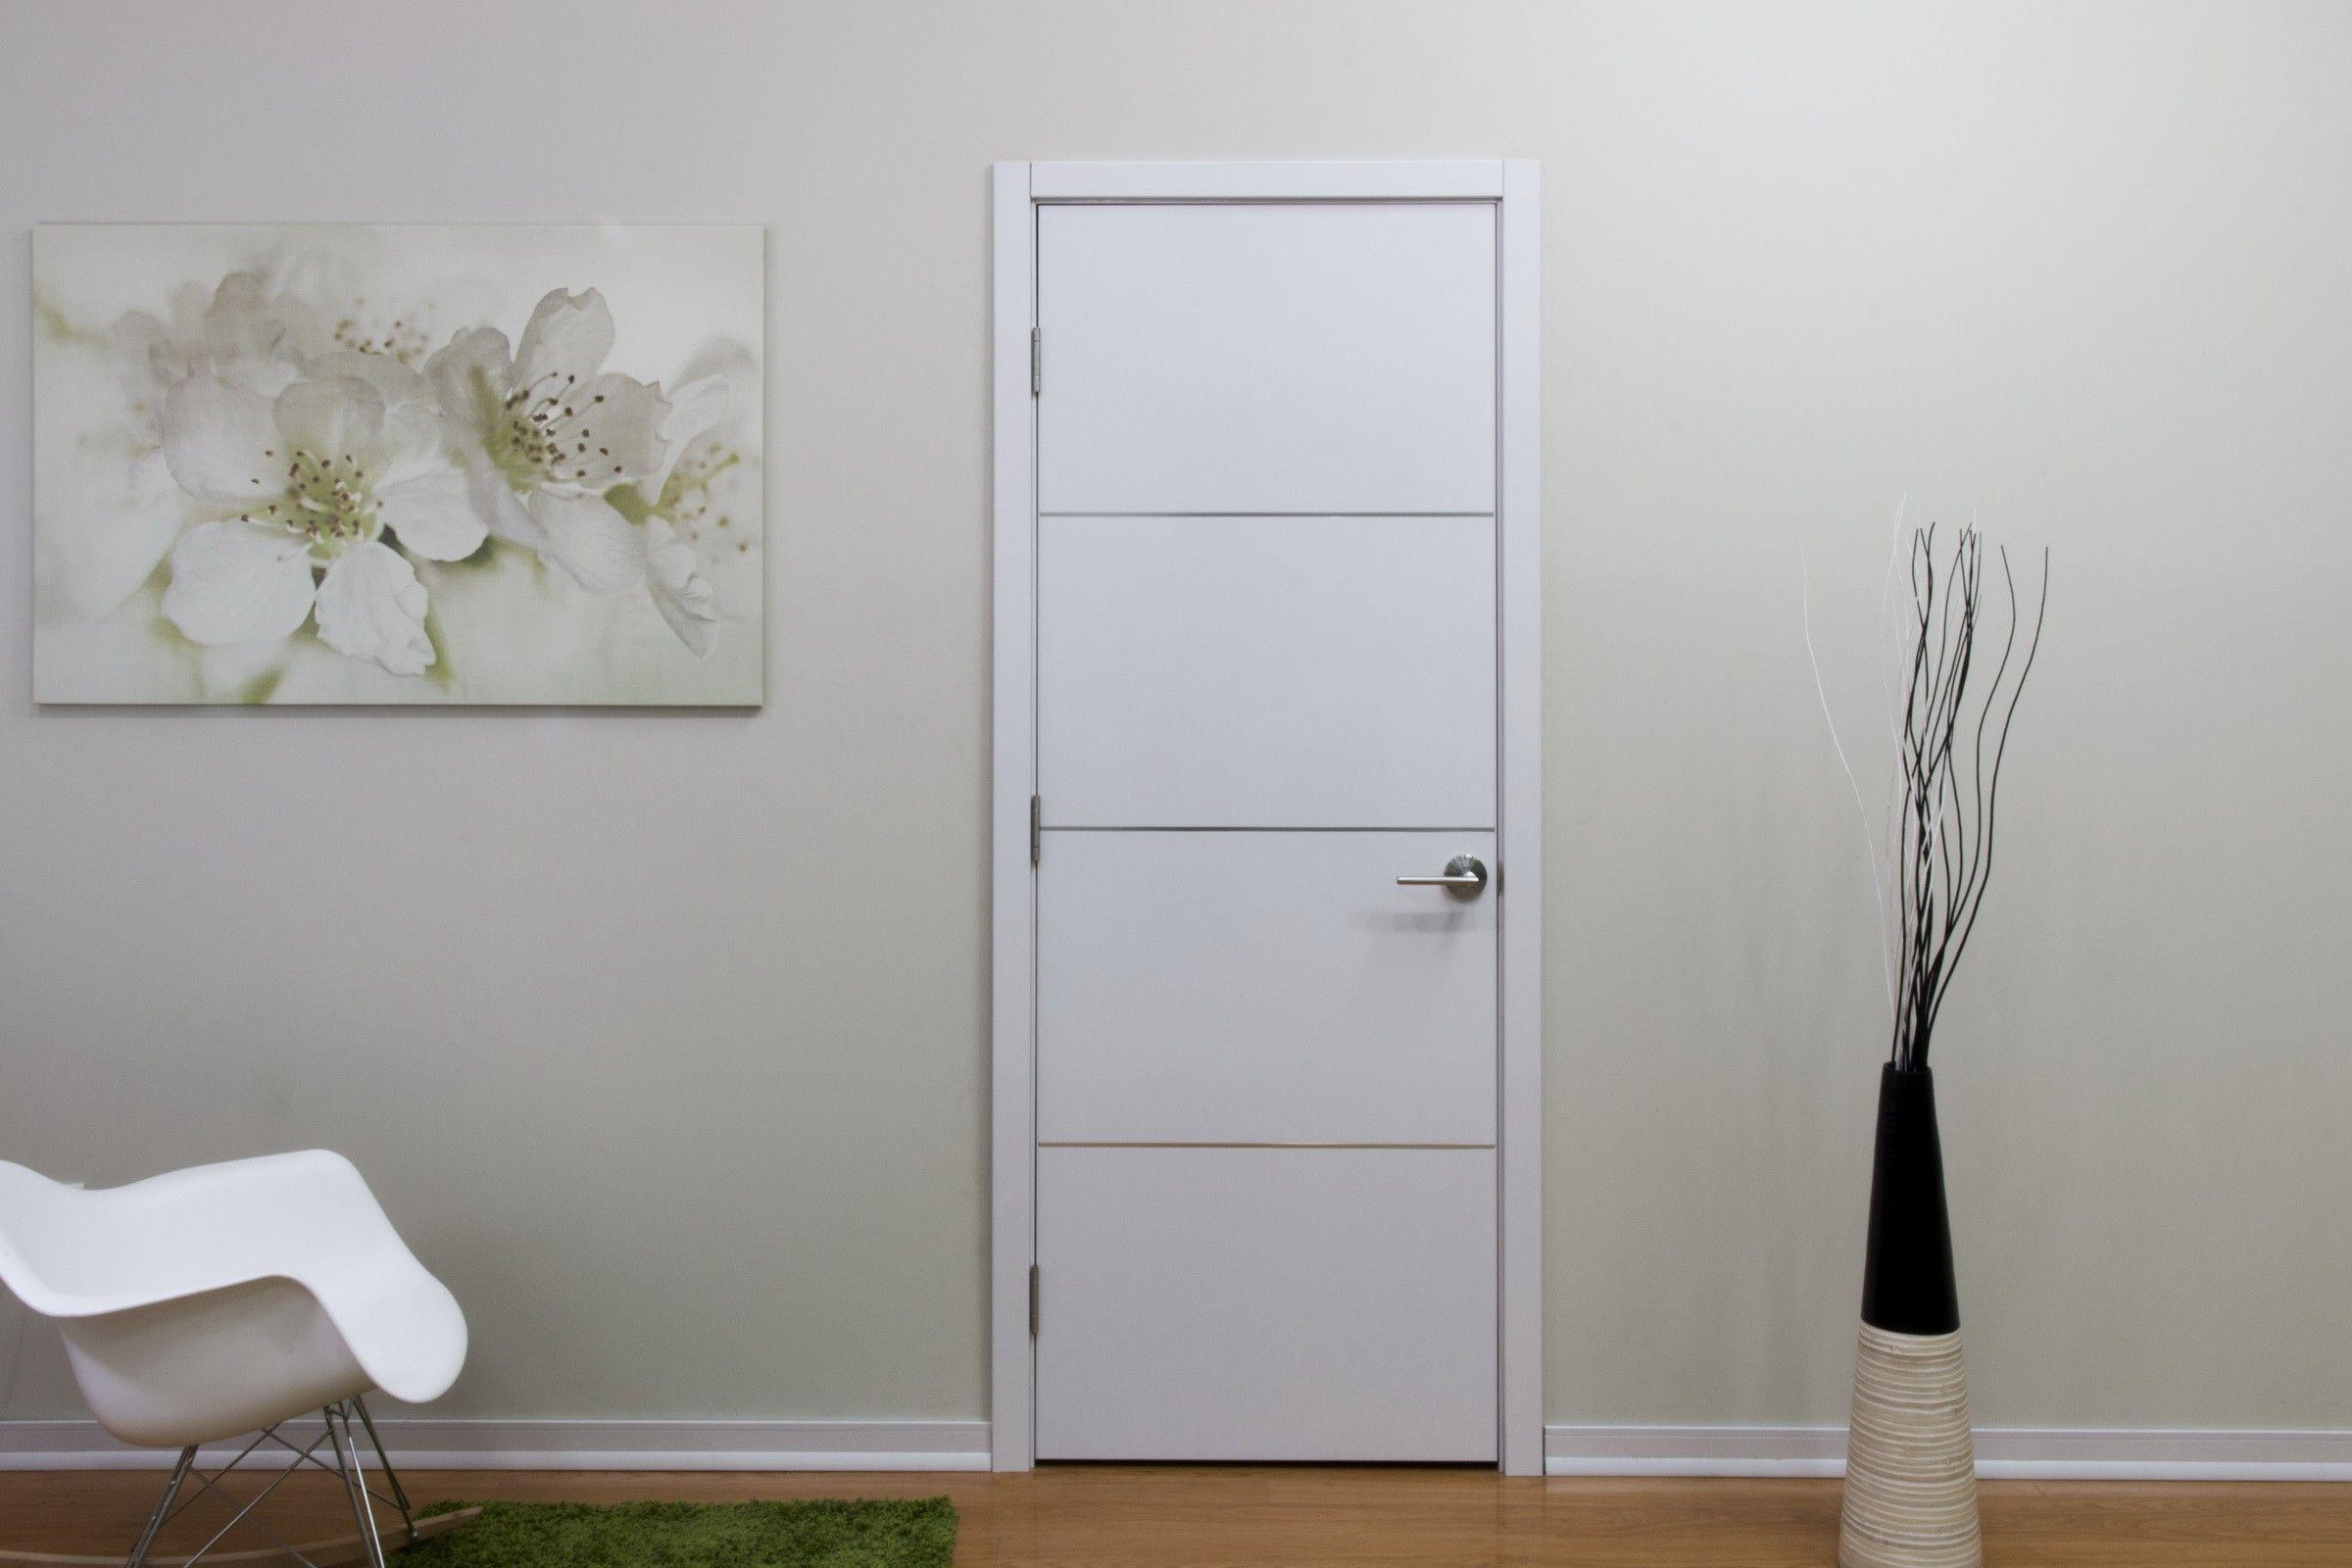 Hg008 White Gloss Laminate Interior Door Contemporary